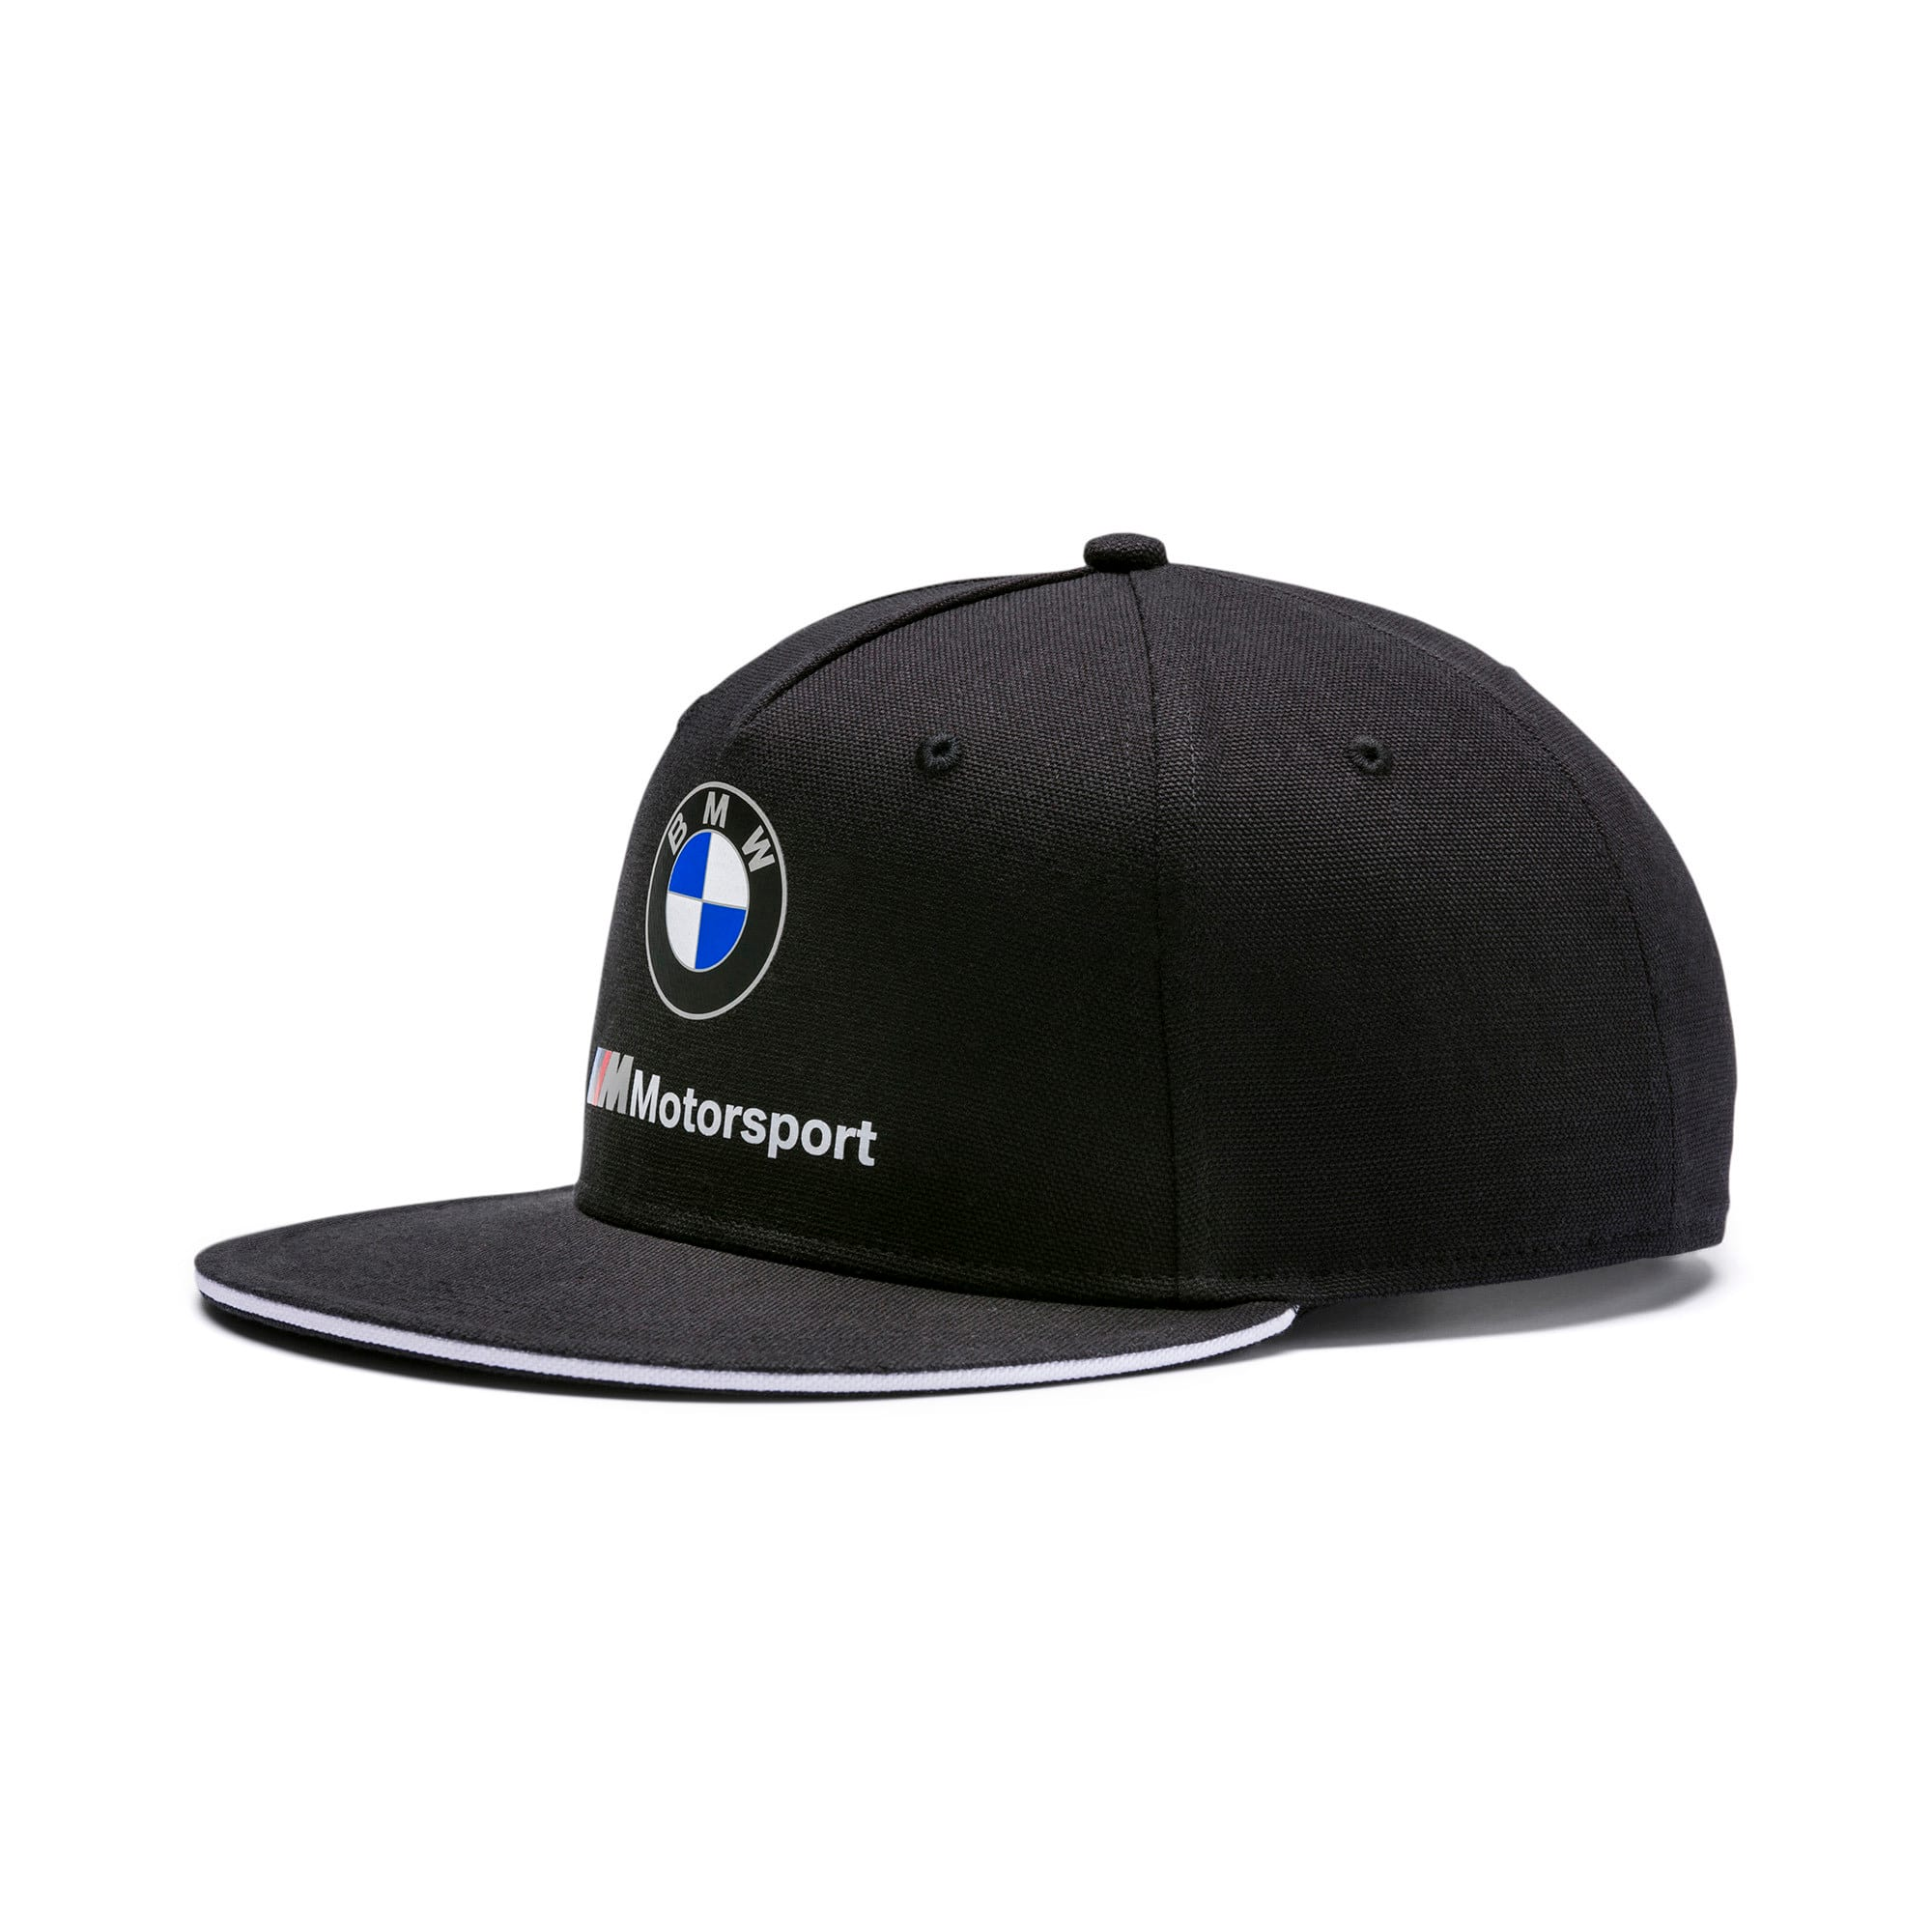 Thumbnail 1 of BMW M モータースポーツ FB キャップ, Puma Black, medium-JPN